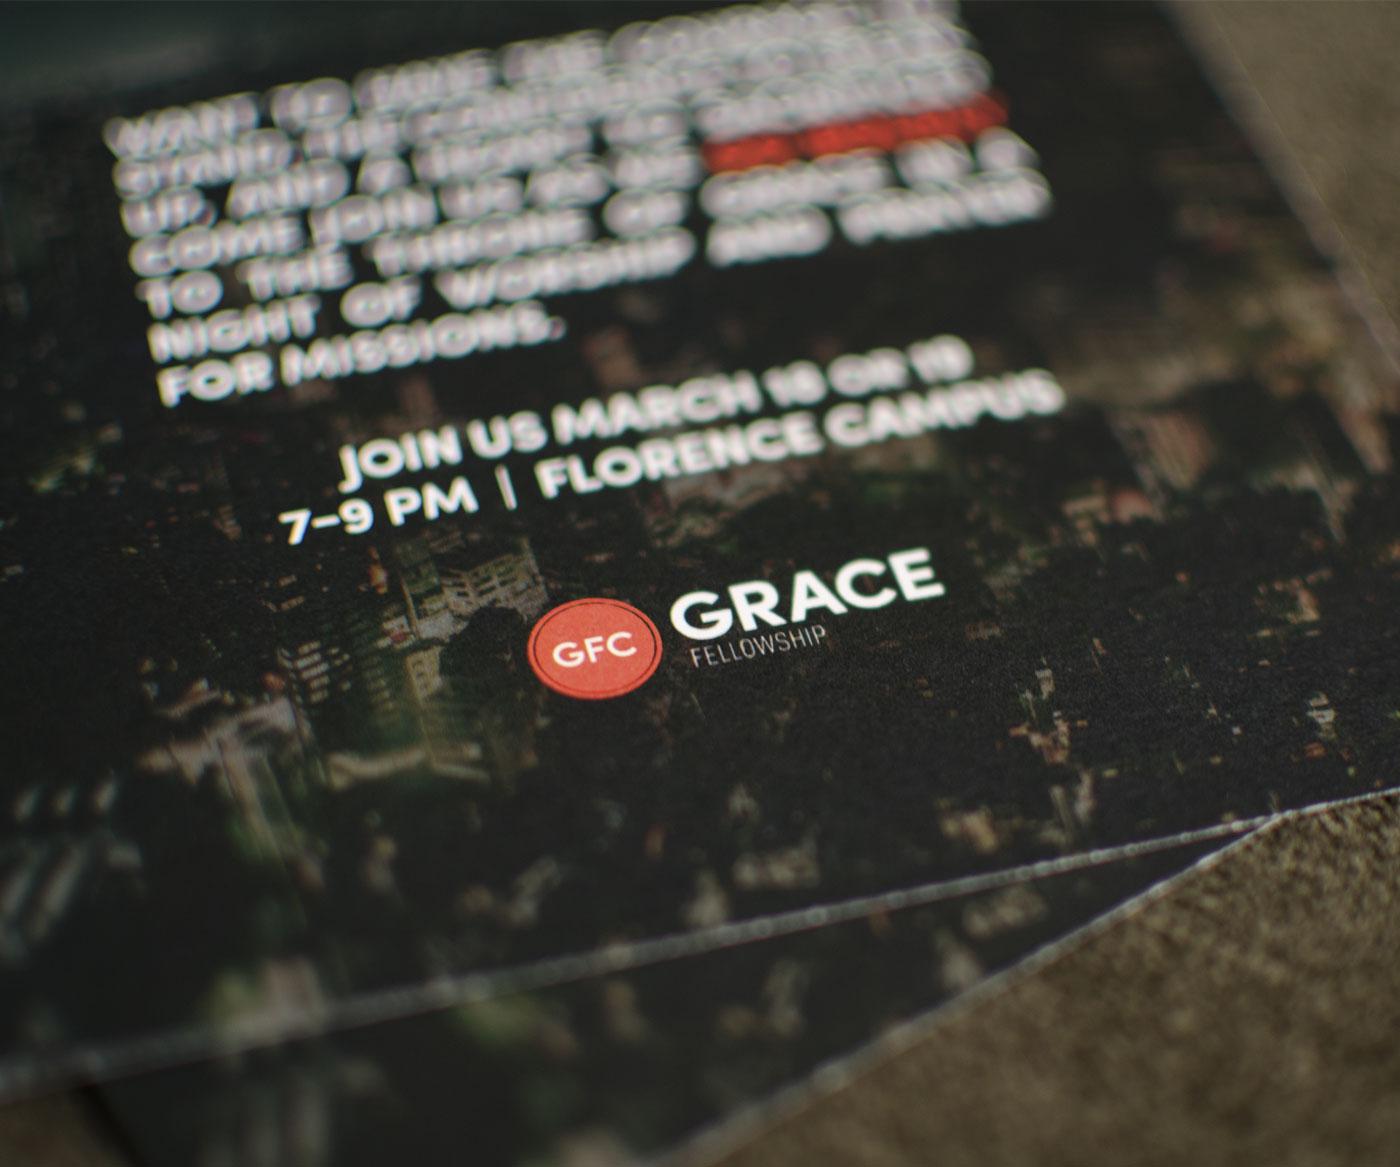 Grace Church Logo on Handouts